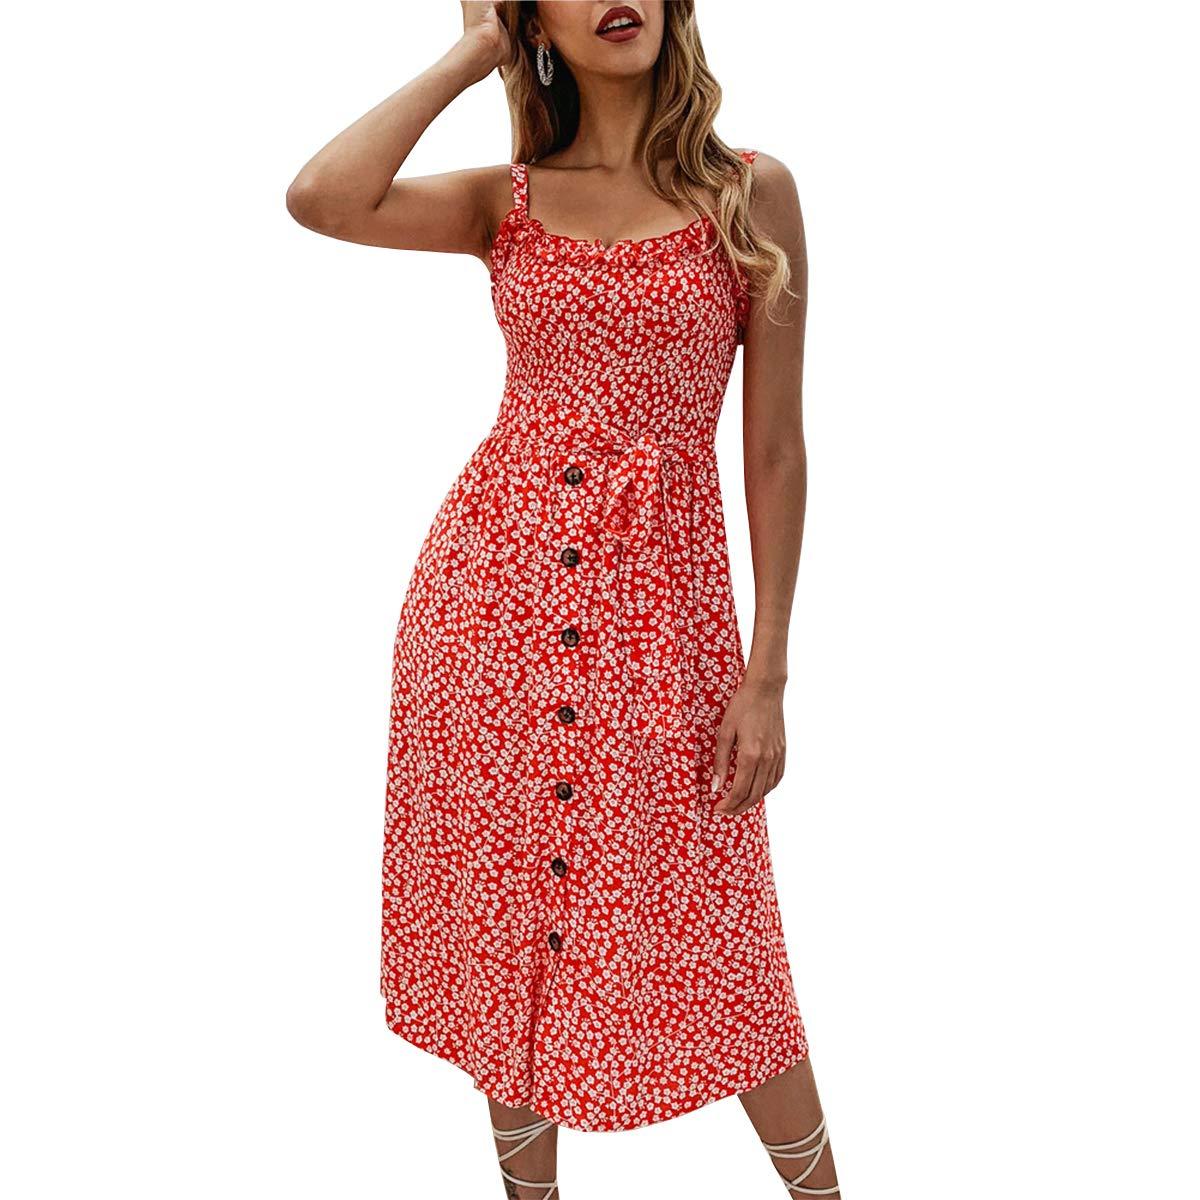 Womwear Women's Floral Button Down Dress Boho Spaghetti Strap Swing Midi Dress Semi-Backless Cocktail Party Long Dress Summer Outfits Tie Waist Beach Sundress with Pockets